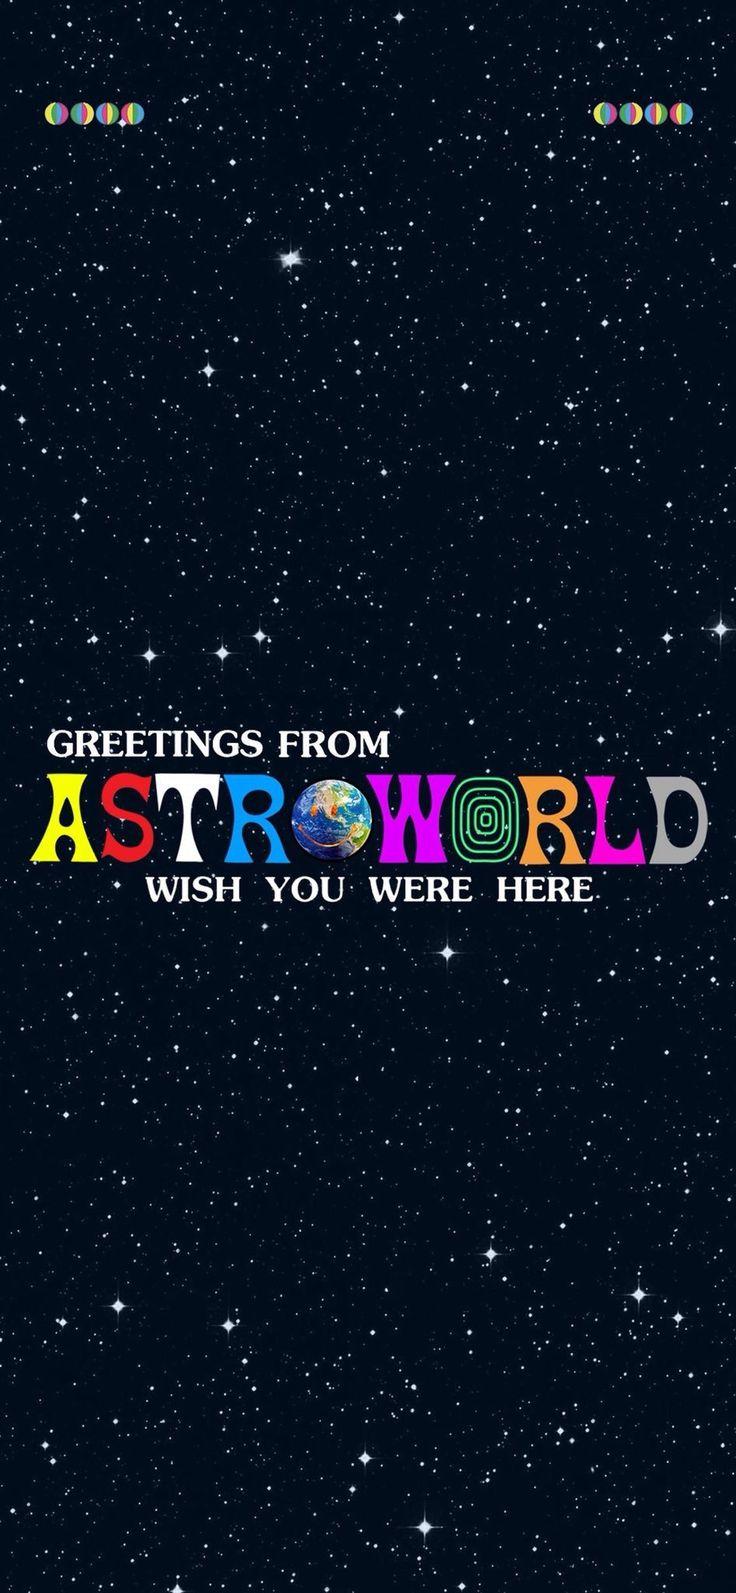 astroworld travisscottwallpapers iphonewallpaper